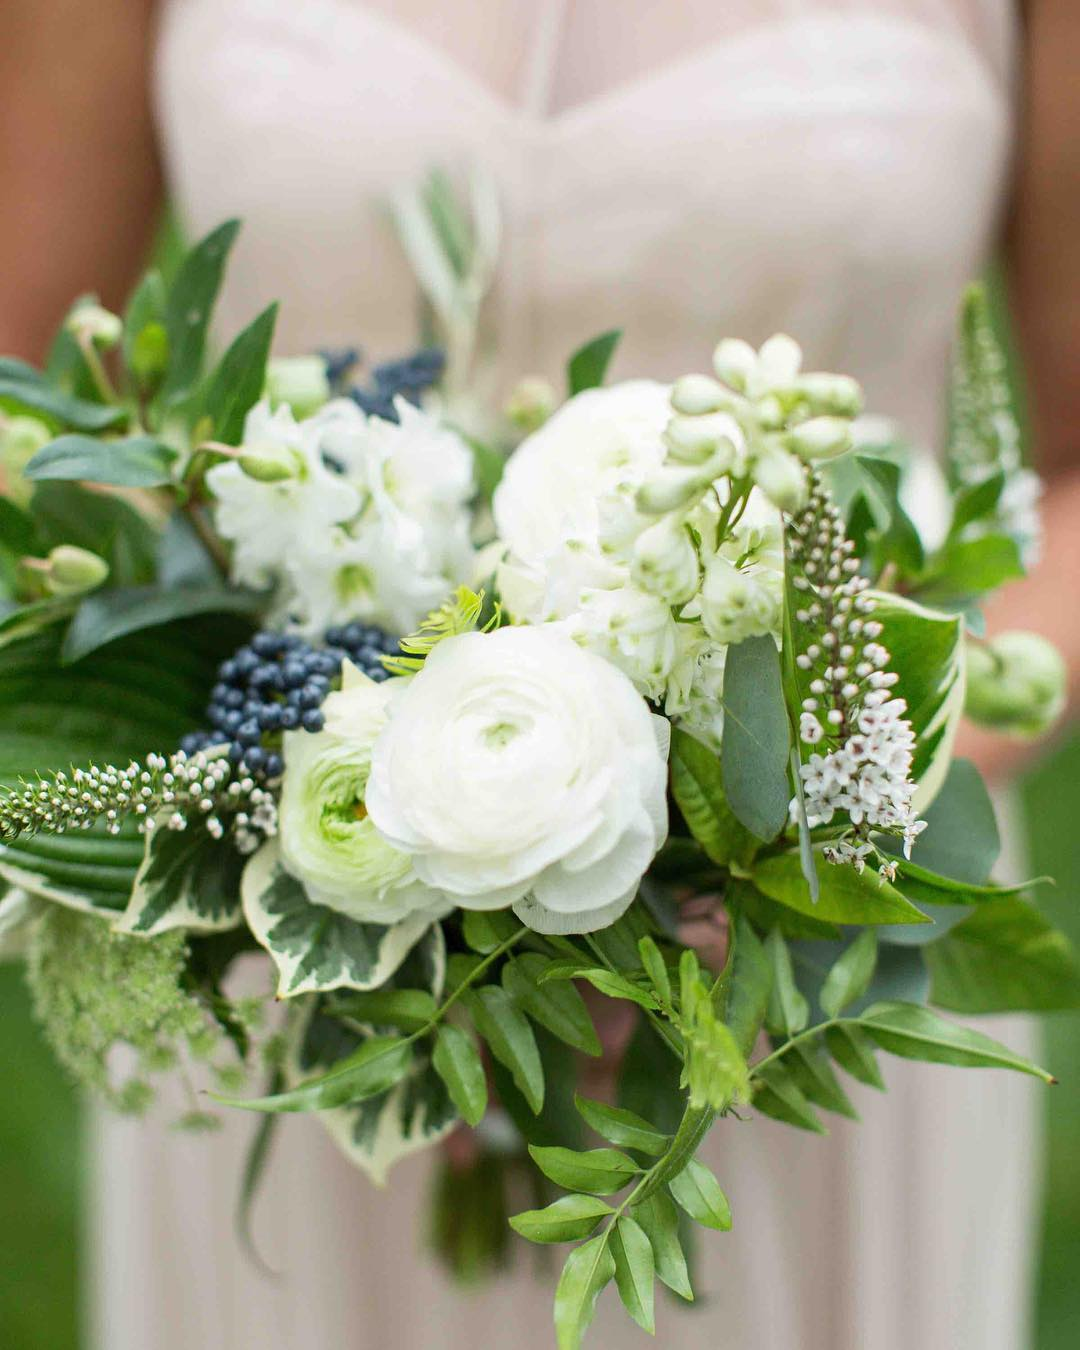 Lotus floral designs 603 491 4063 gorgeous wedding event hergirl bridesmaids bouquet lovely neutrals greenery rustic woodland romantic nhwedding lakeside lakesregion prettyflowers lotusfloraldesigns izmirmasajfo